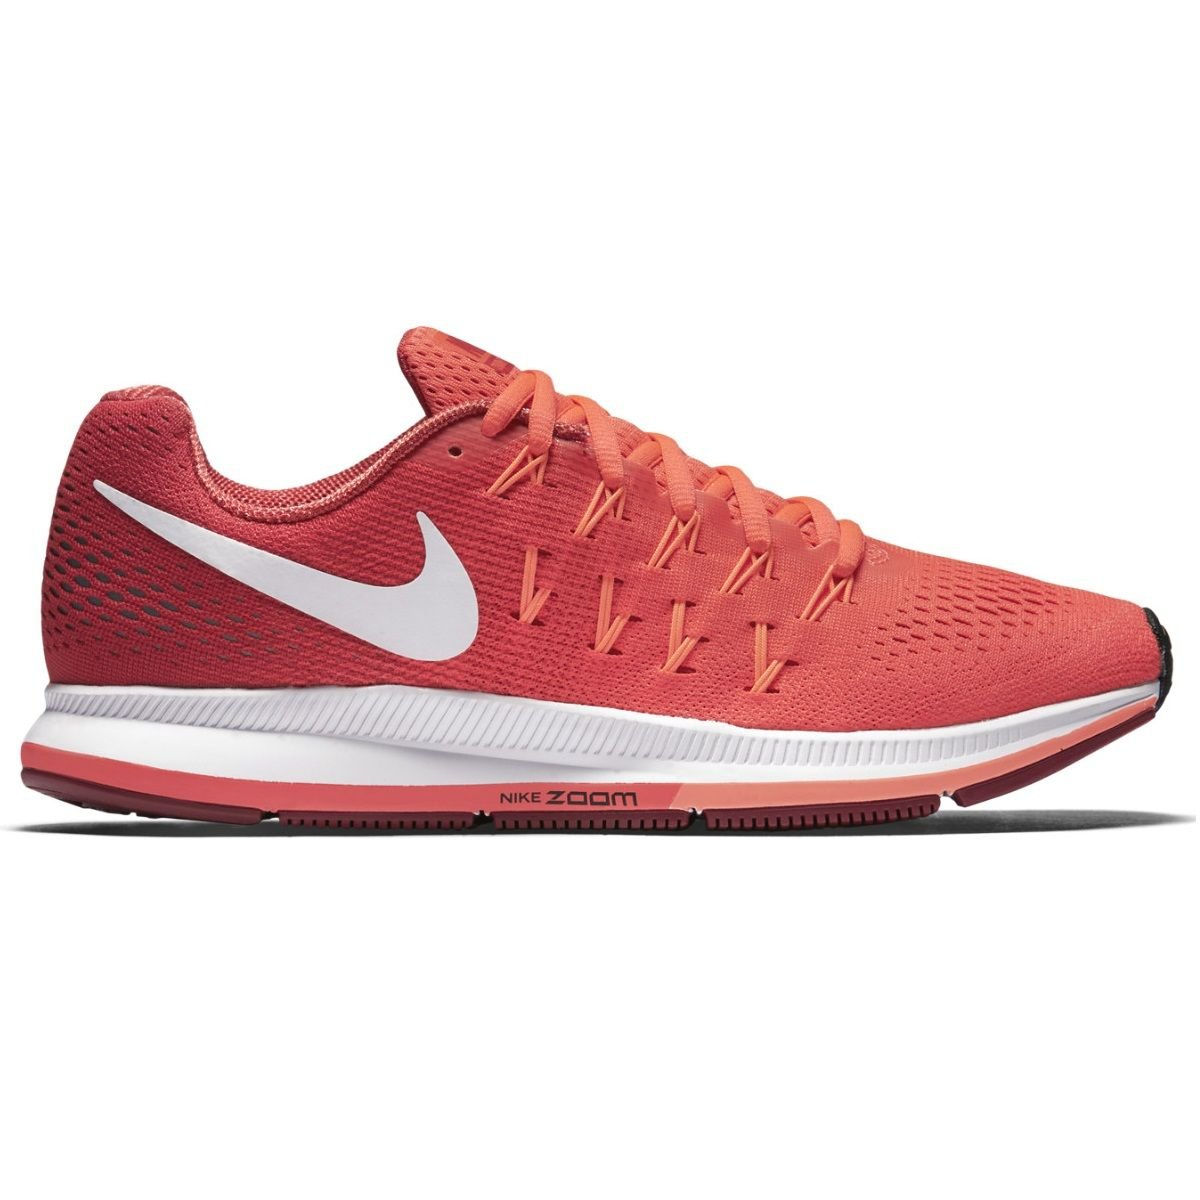 Nike Womens Air Zoom Pegasus 33 Running Shoe Bright Crimson/White/Gym Red/Bright Mango 8.5